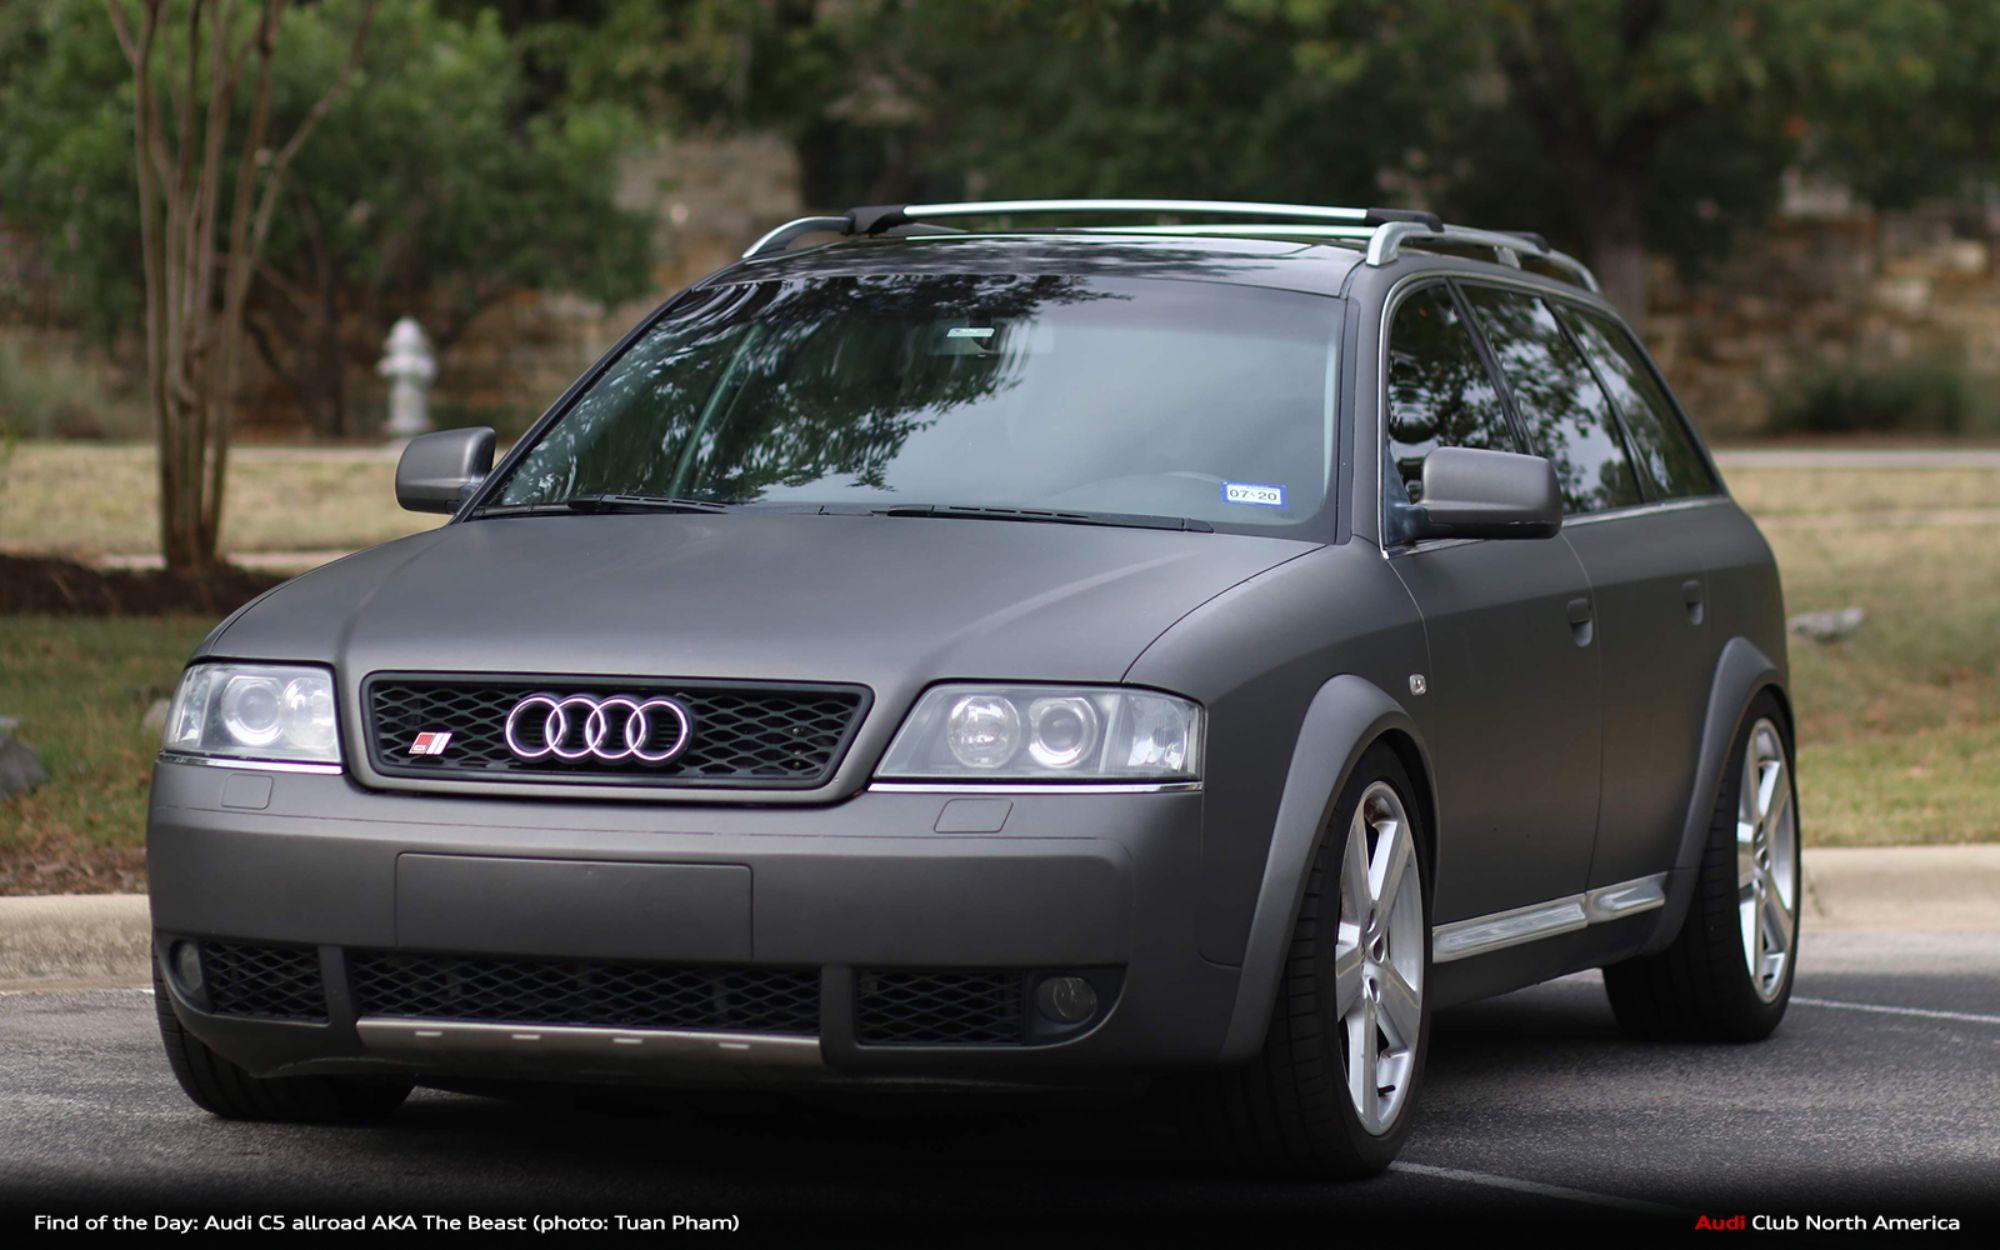 Kelebihan Audi C5 Tangguh